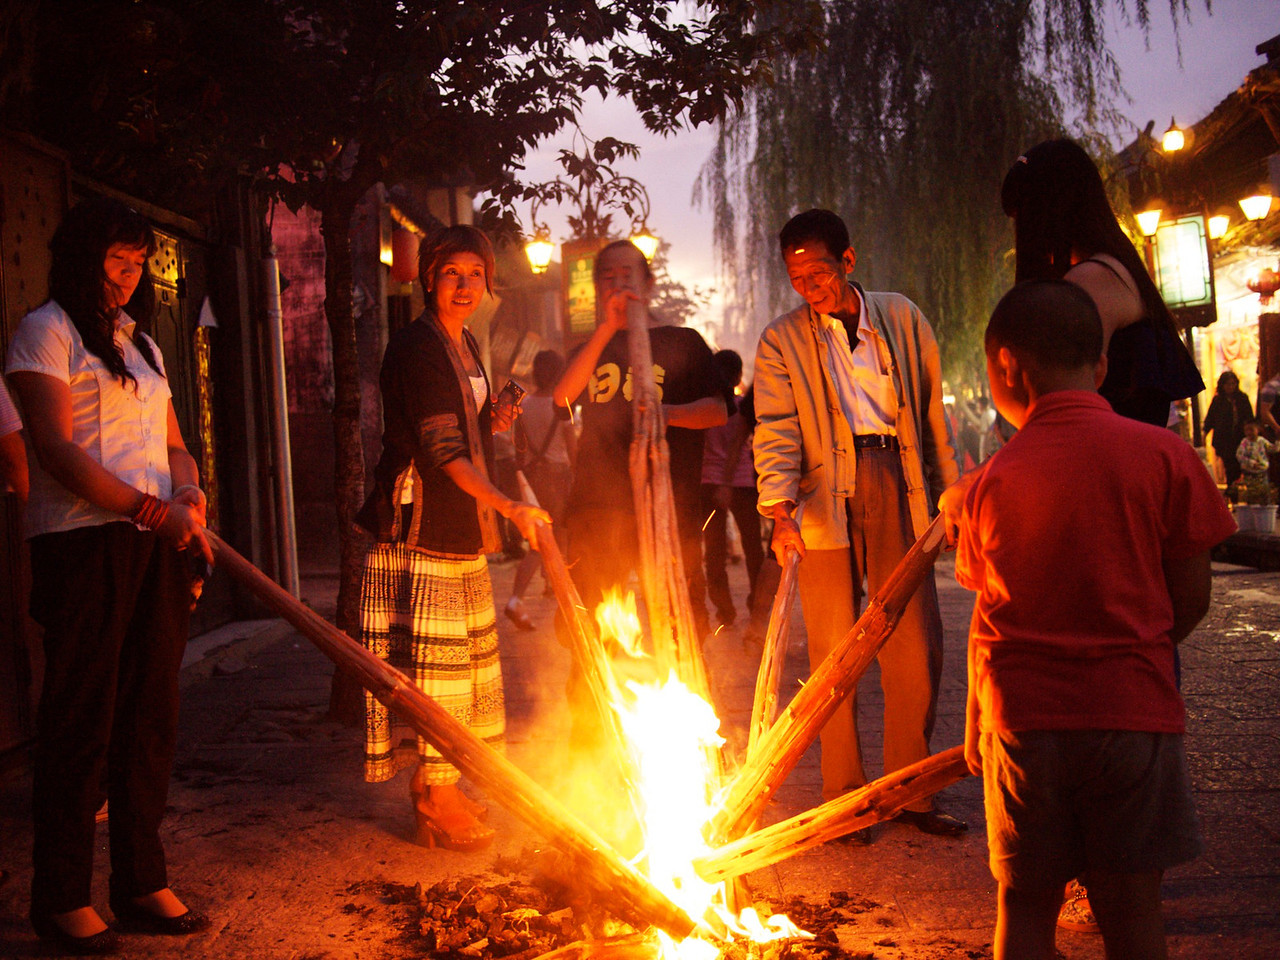 Back in Dali the torch festival took a different tone